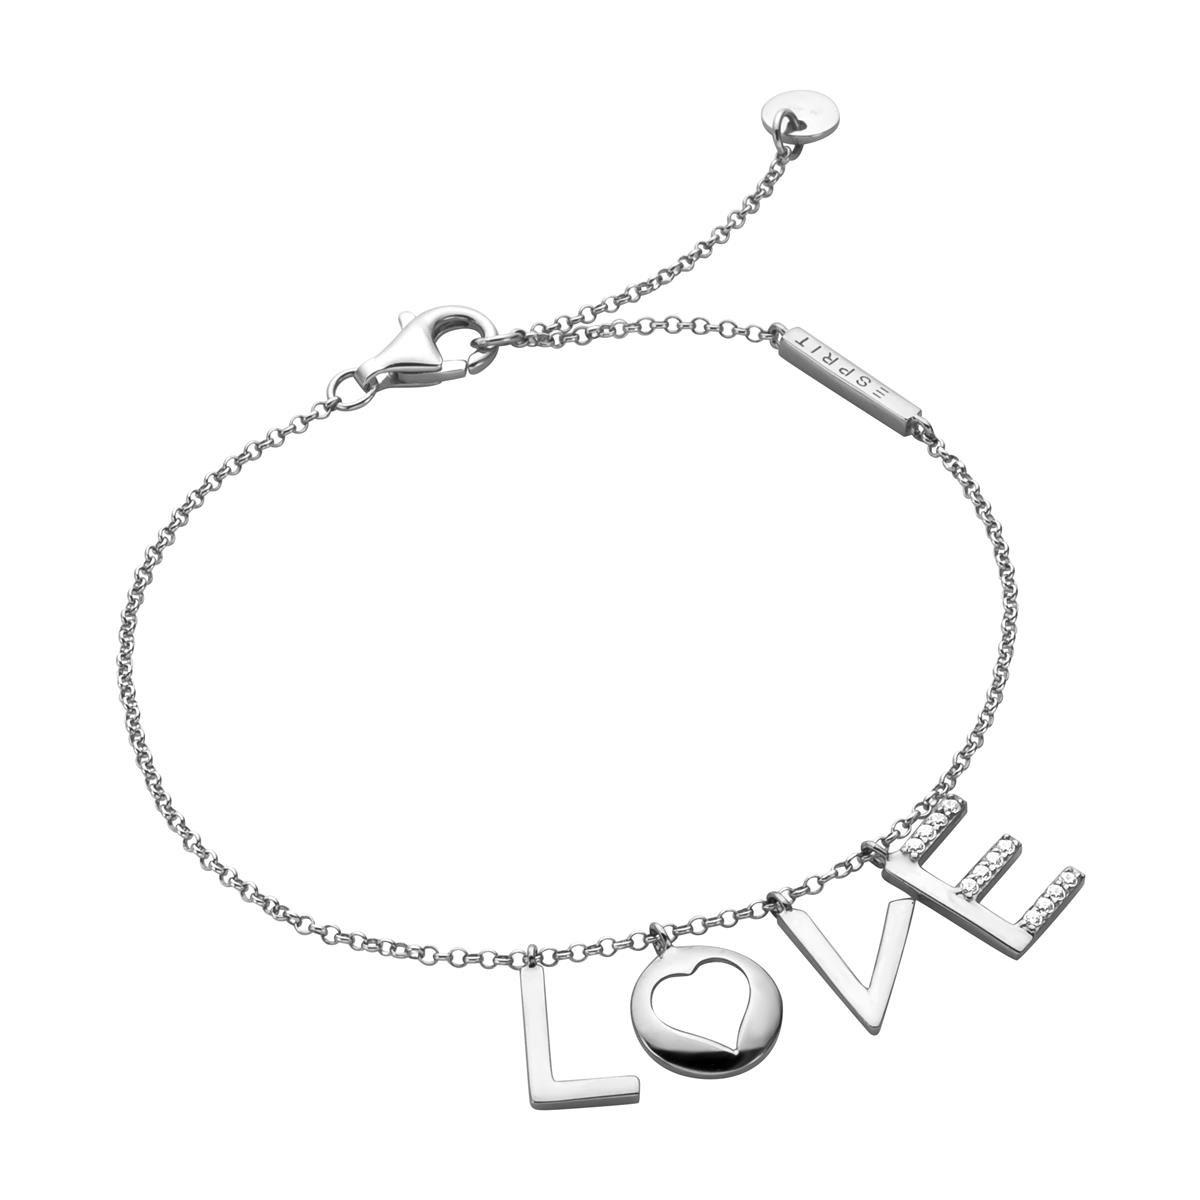 ESBR00231118 Armband Amory Silber mit Zirkonia